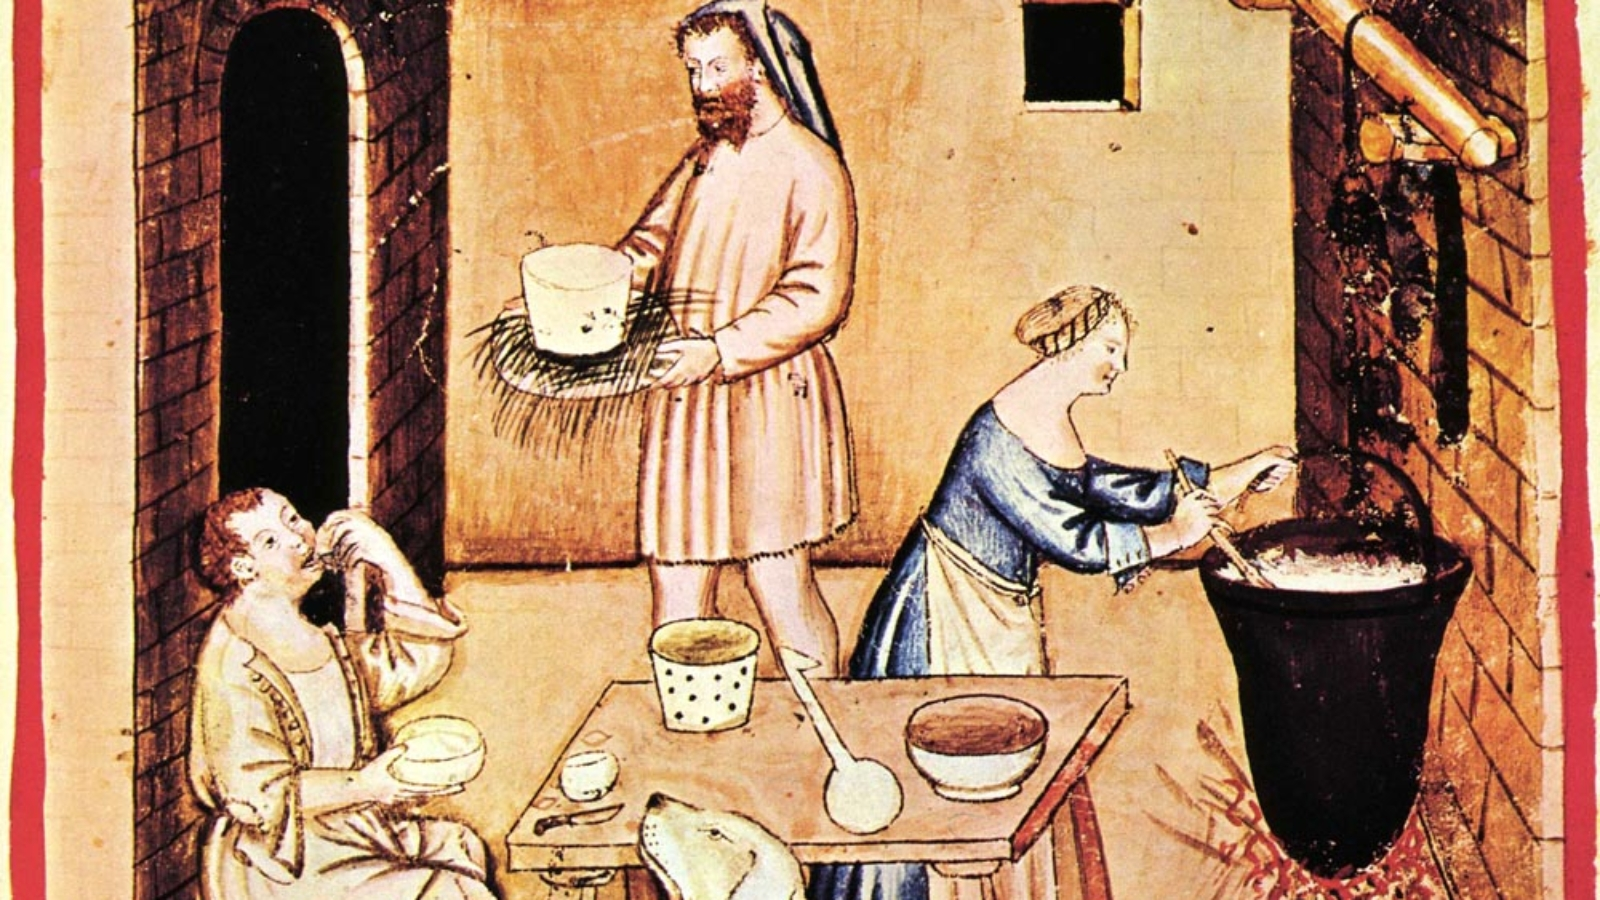 9-alimenti,_formaggi,Taccuino_Sanitatis,_Casanatense_4182.